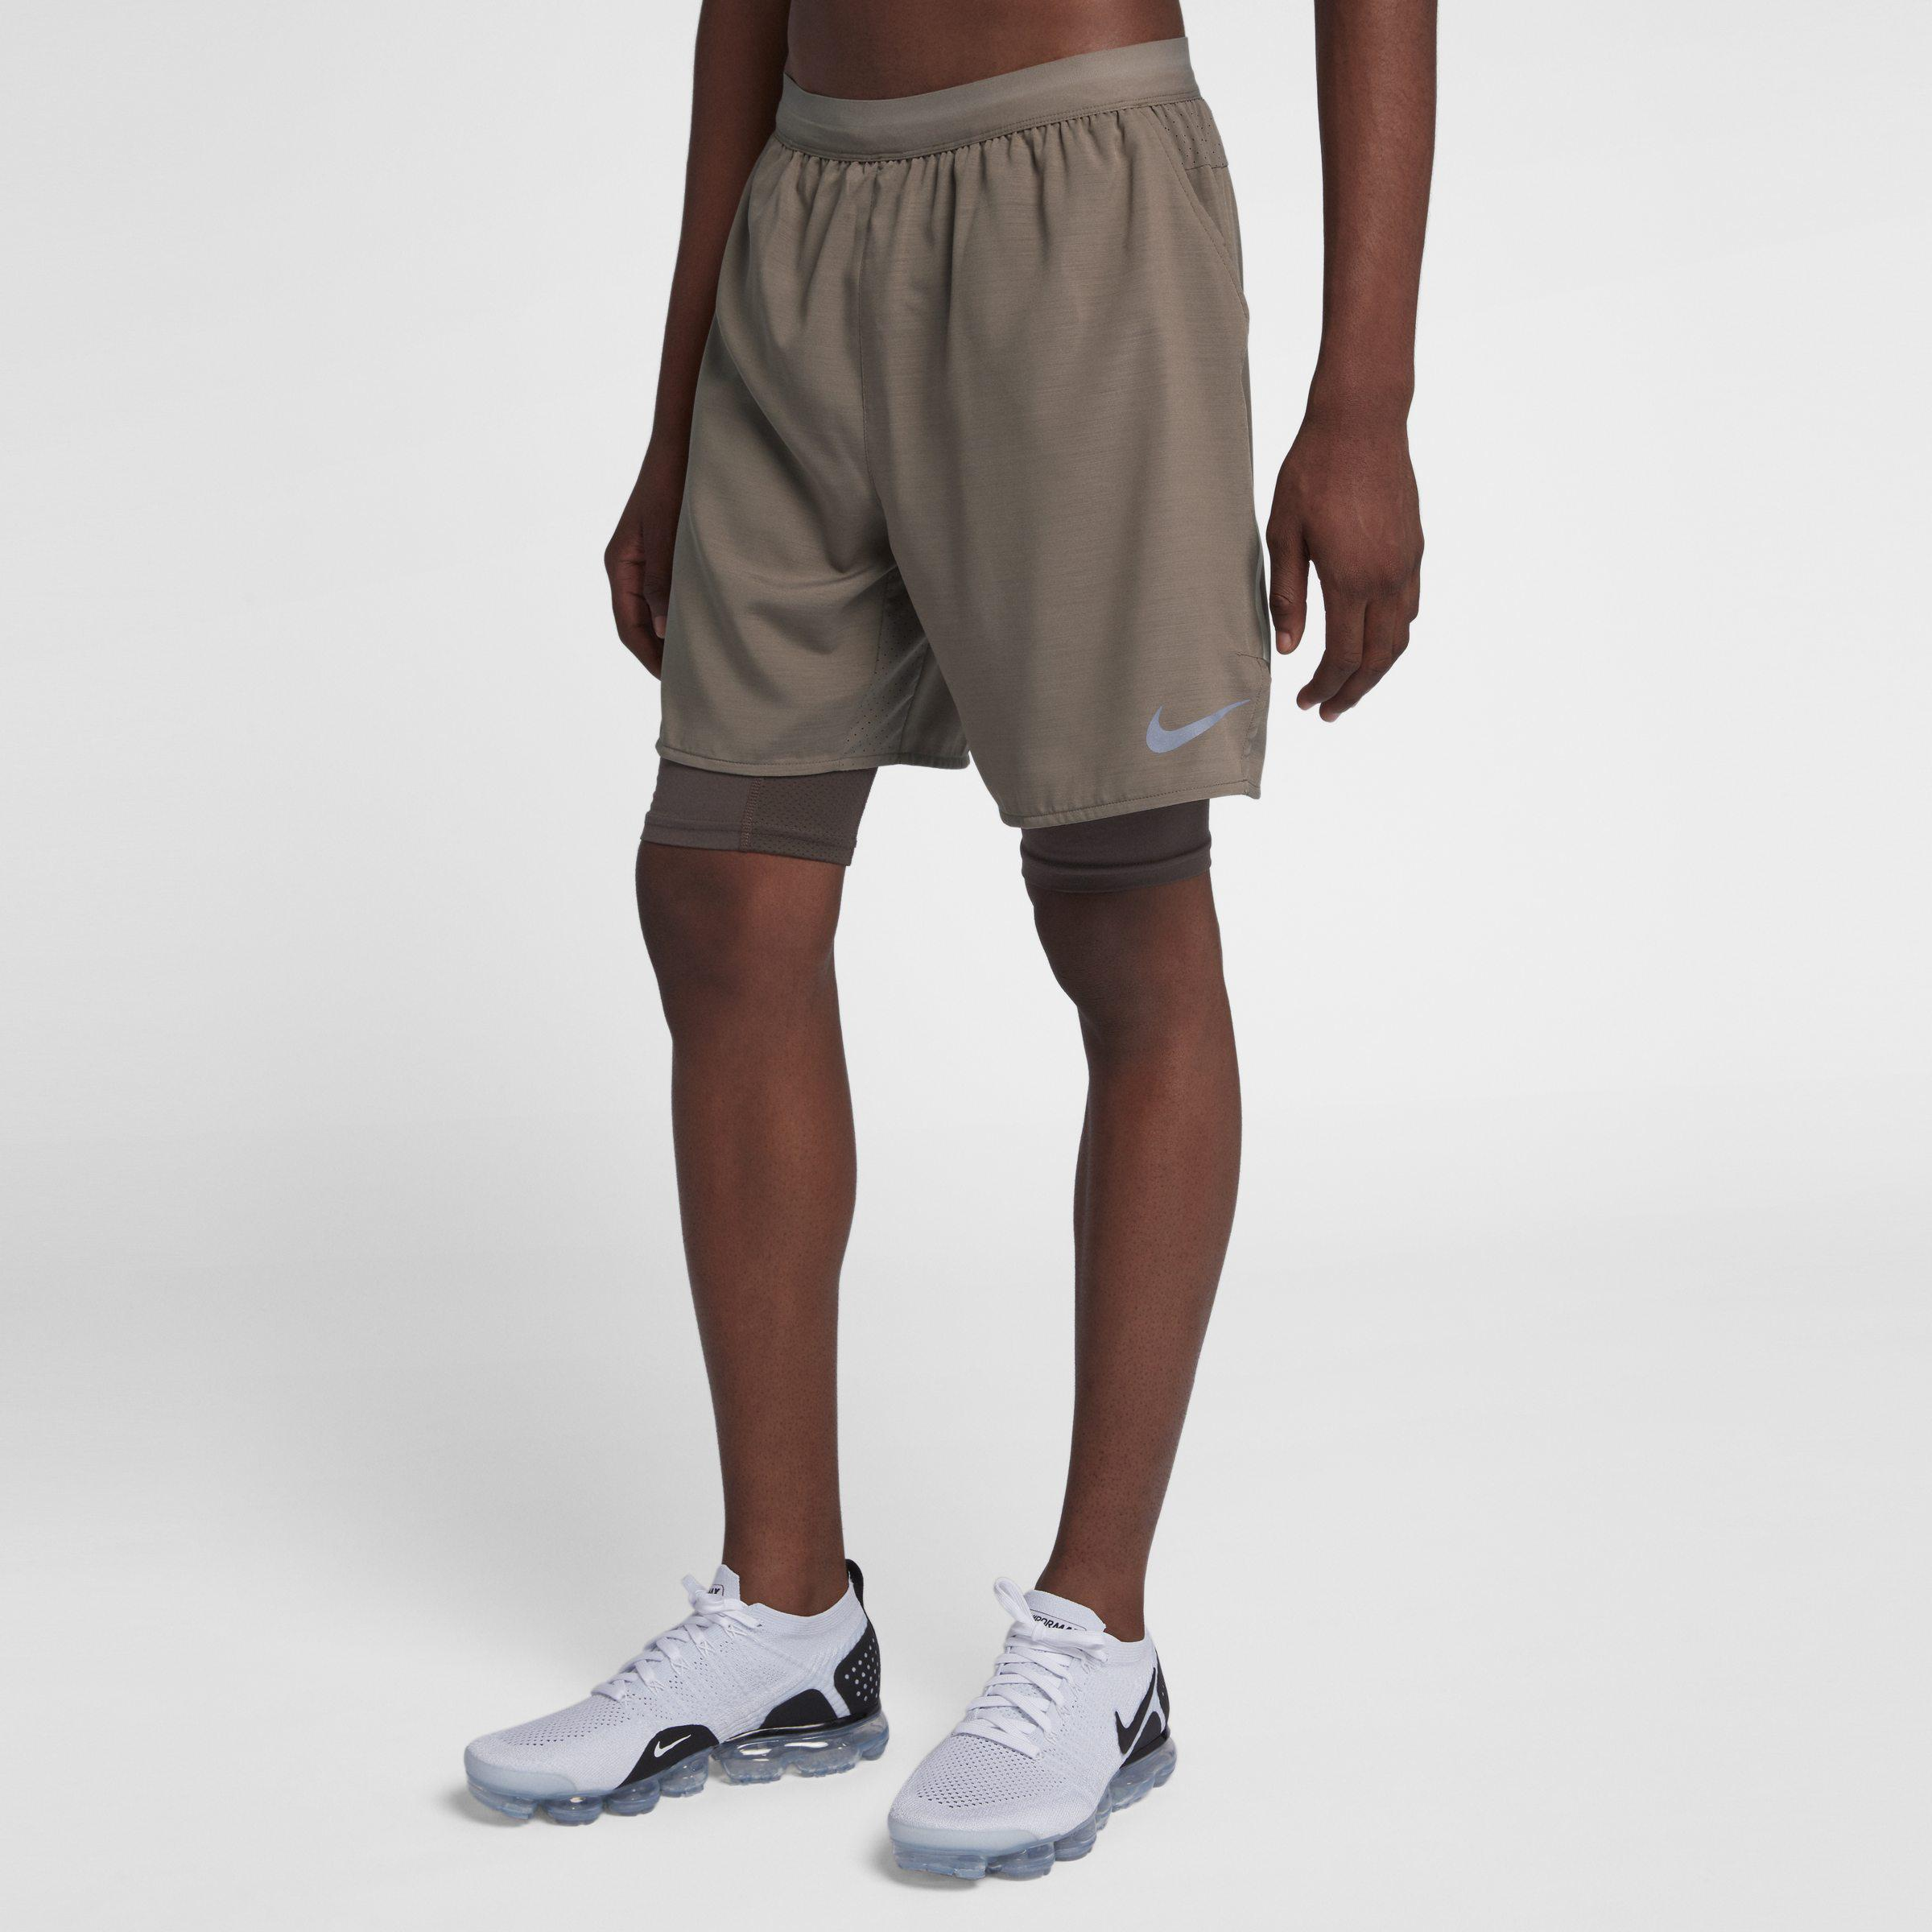 c1d606c092f7 Nike Flex Stride 2-in-1 Running Shorts in Brown for Men - Lyst